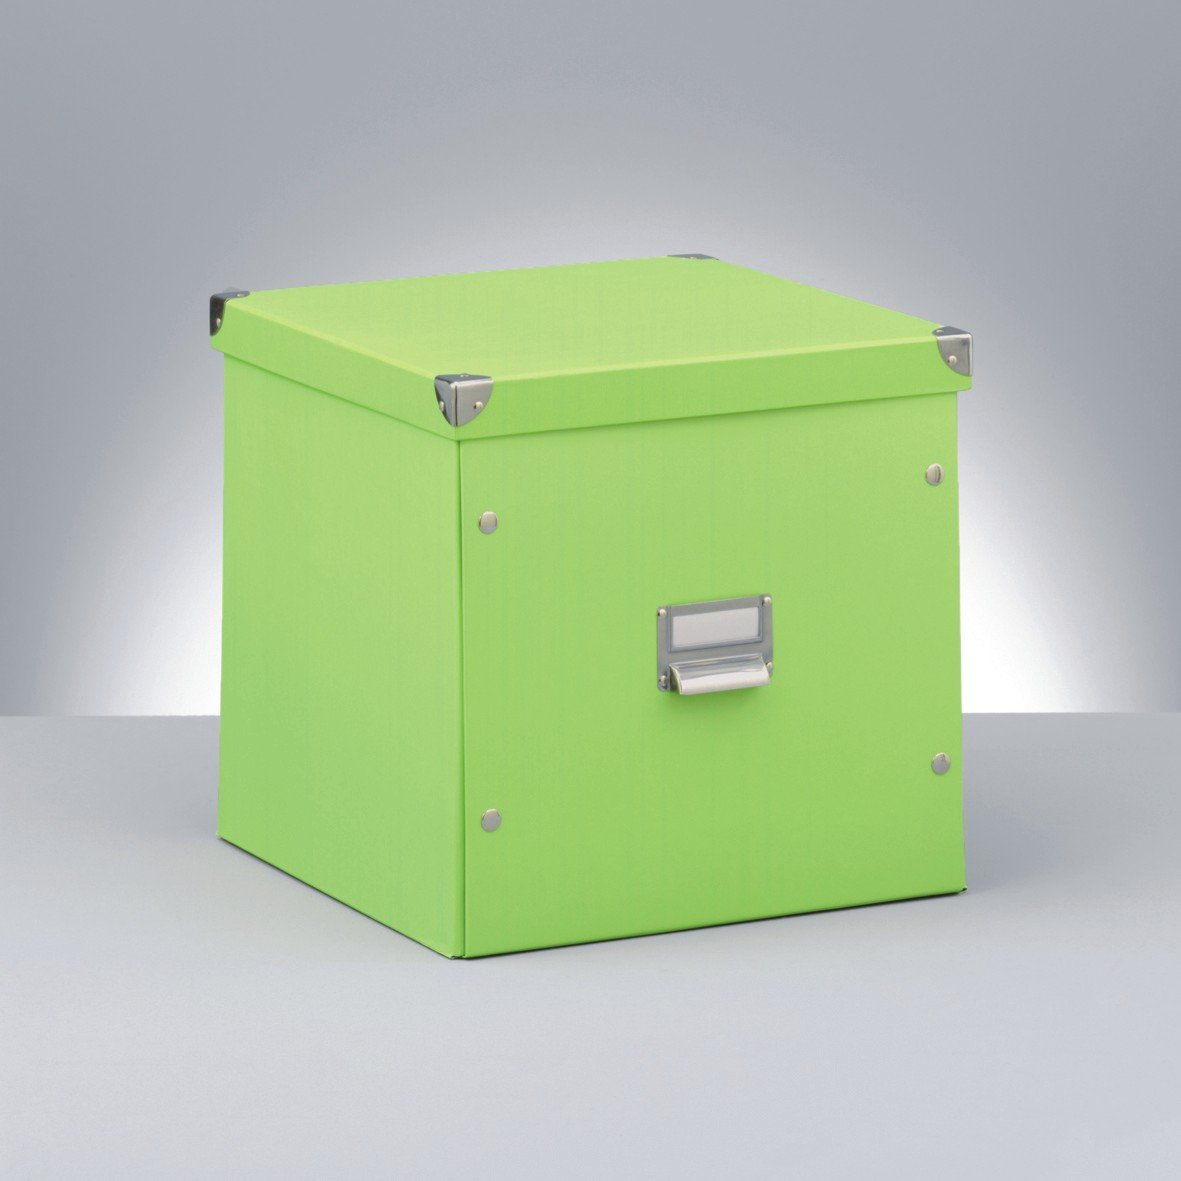 boite de classement carton boite de classement carton. Black Bedroom Furniture Sets. Home Design Ideas